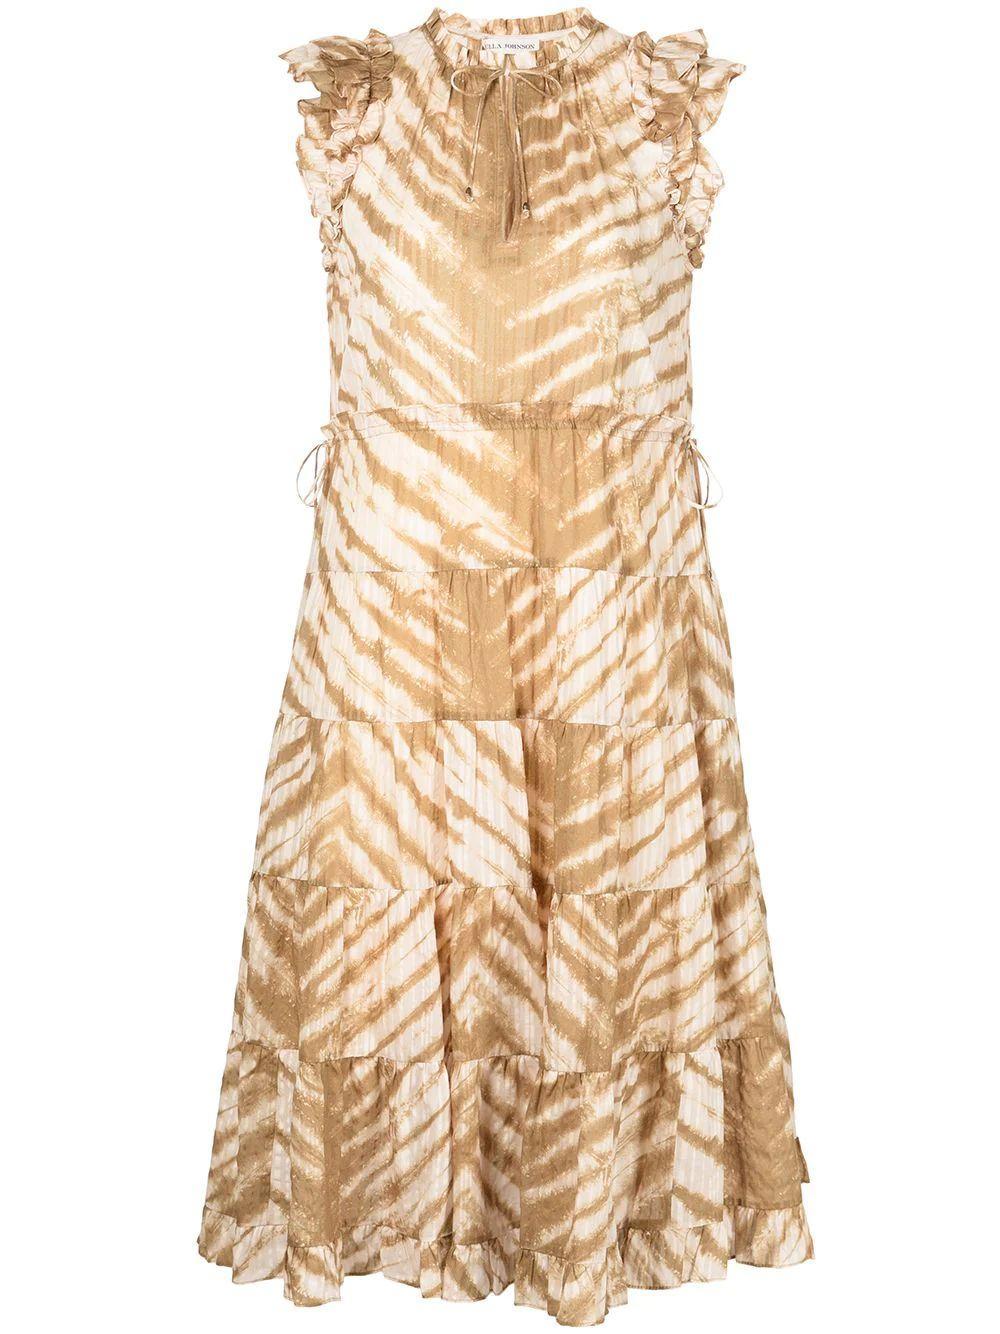 Pilar Tiger Tie Dye Midi Dress Item # PF210131